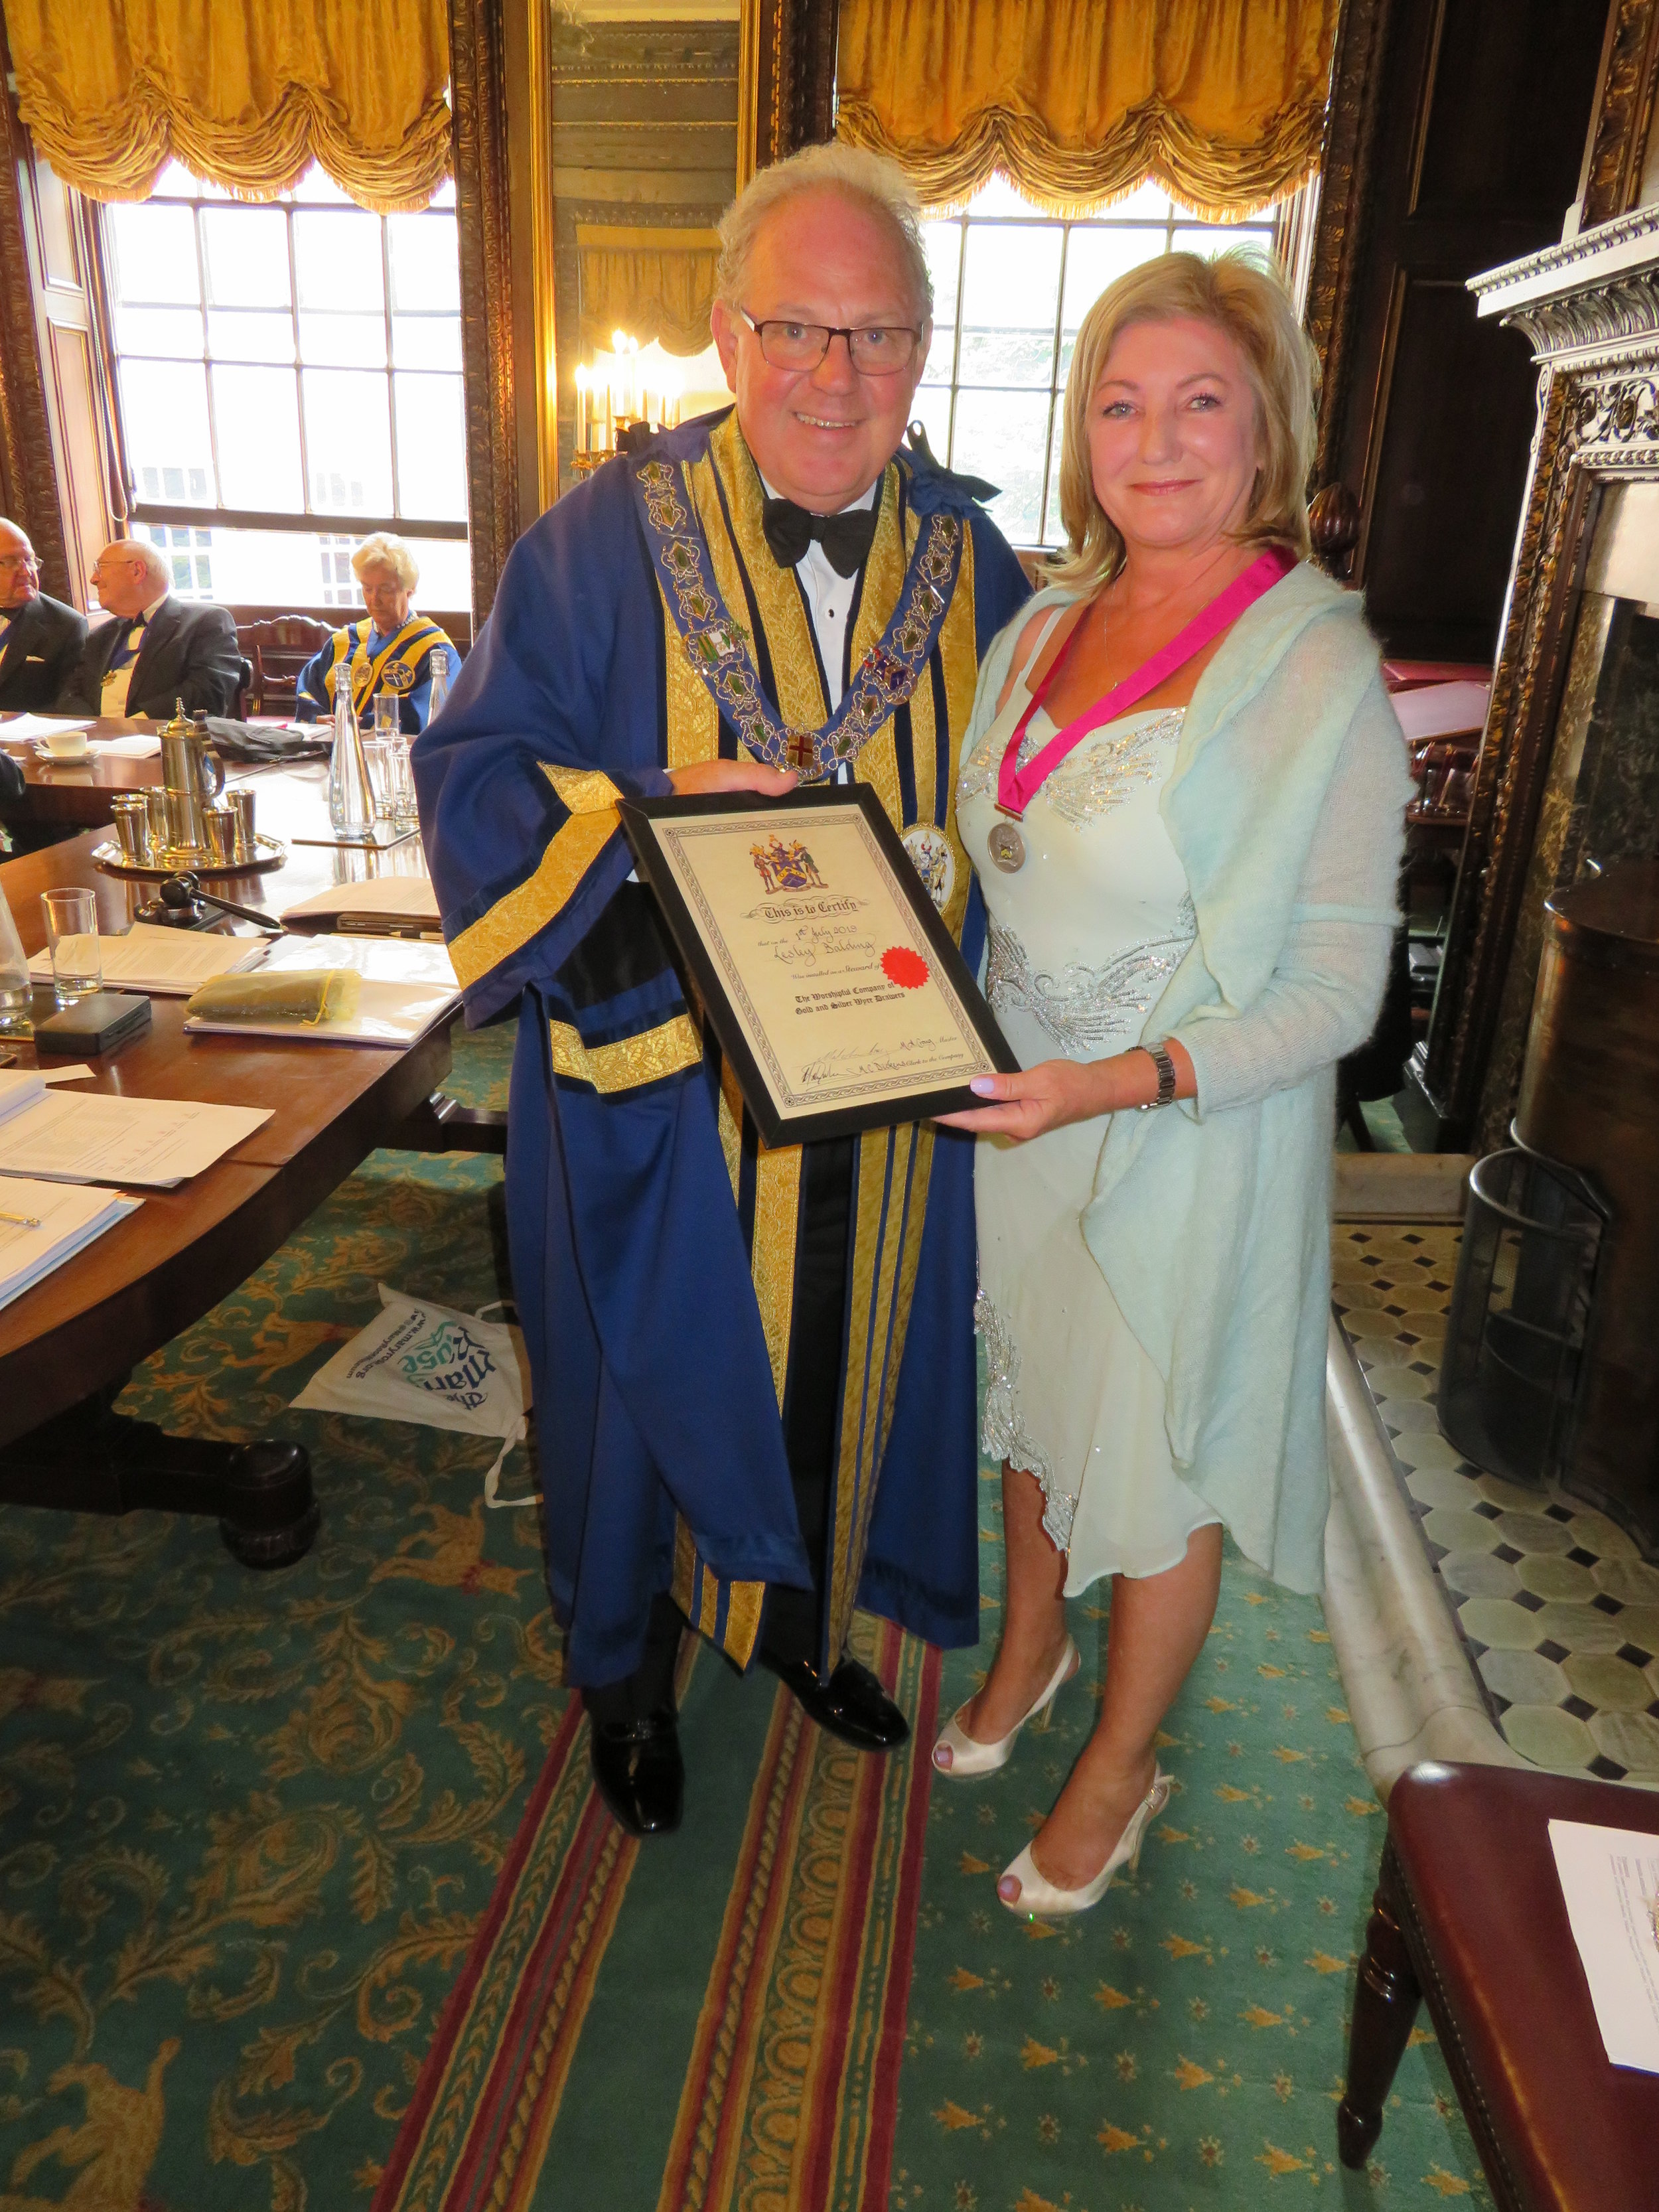 The Master & Steward, Liveryman Lesley Balding